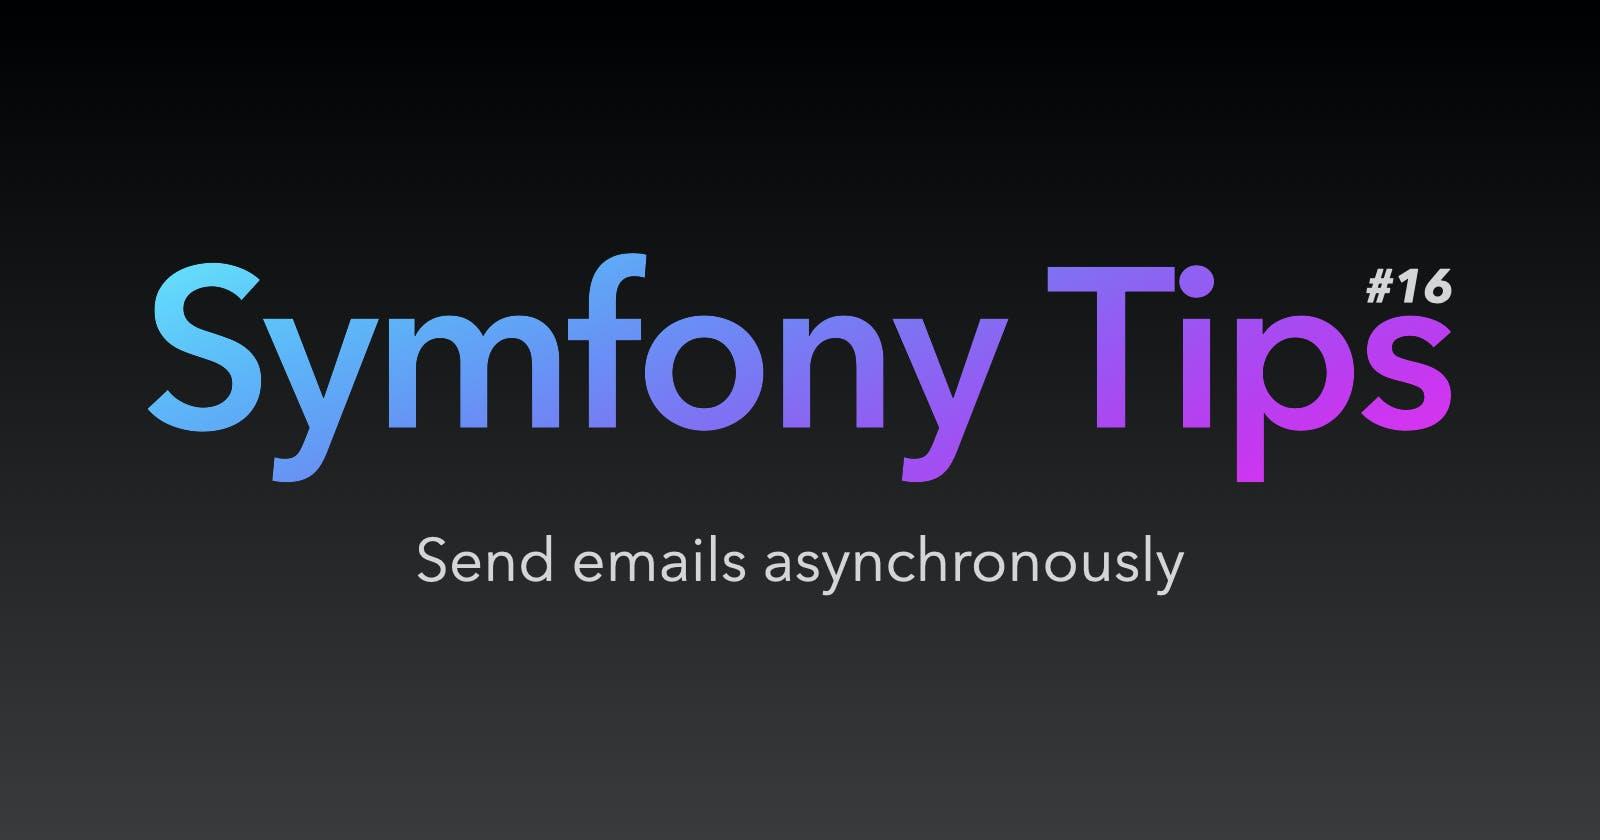 Symfony Tips #16 - Send emails asynchronously